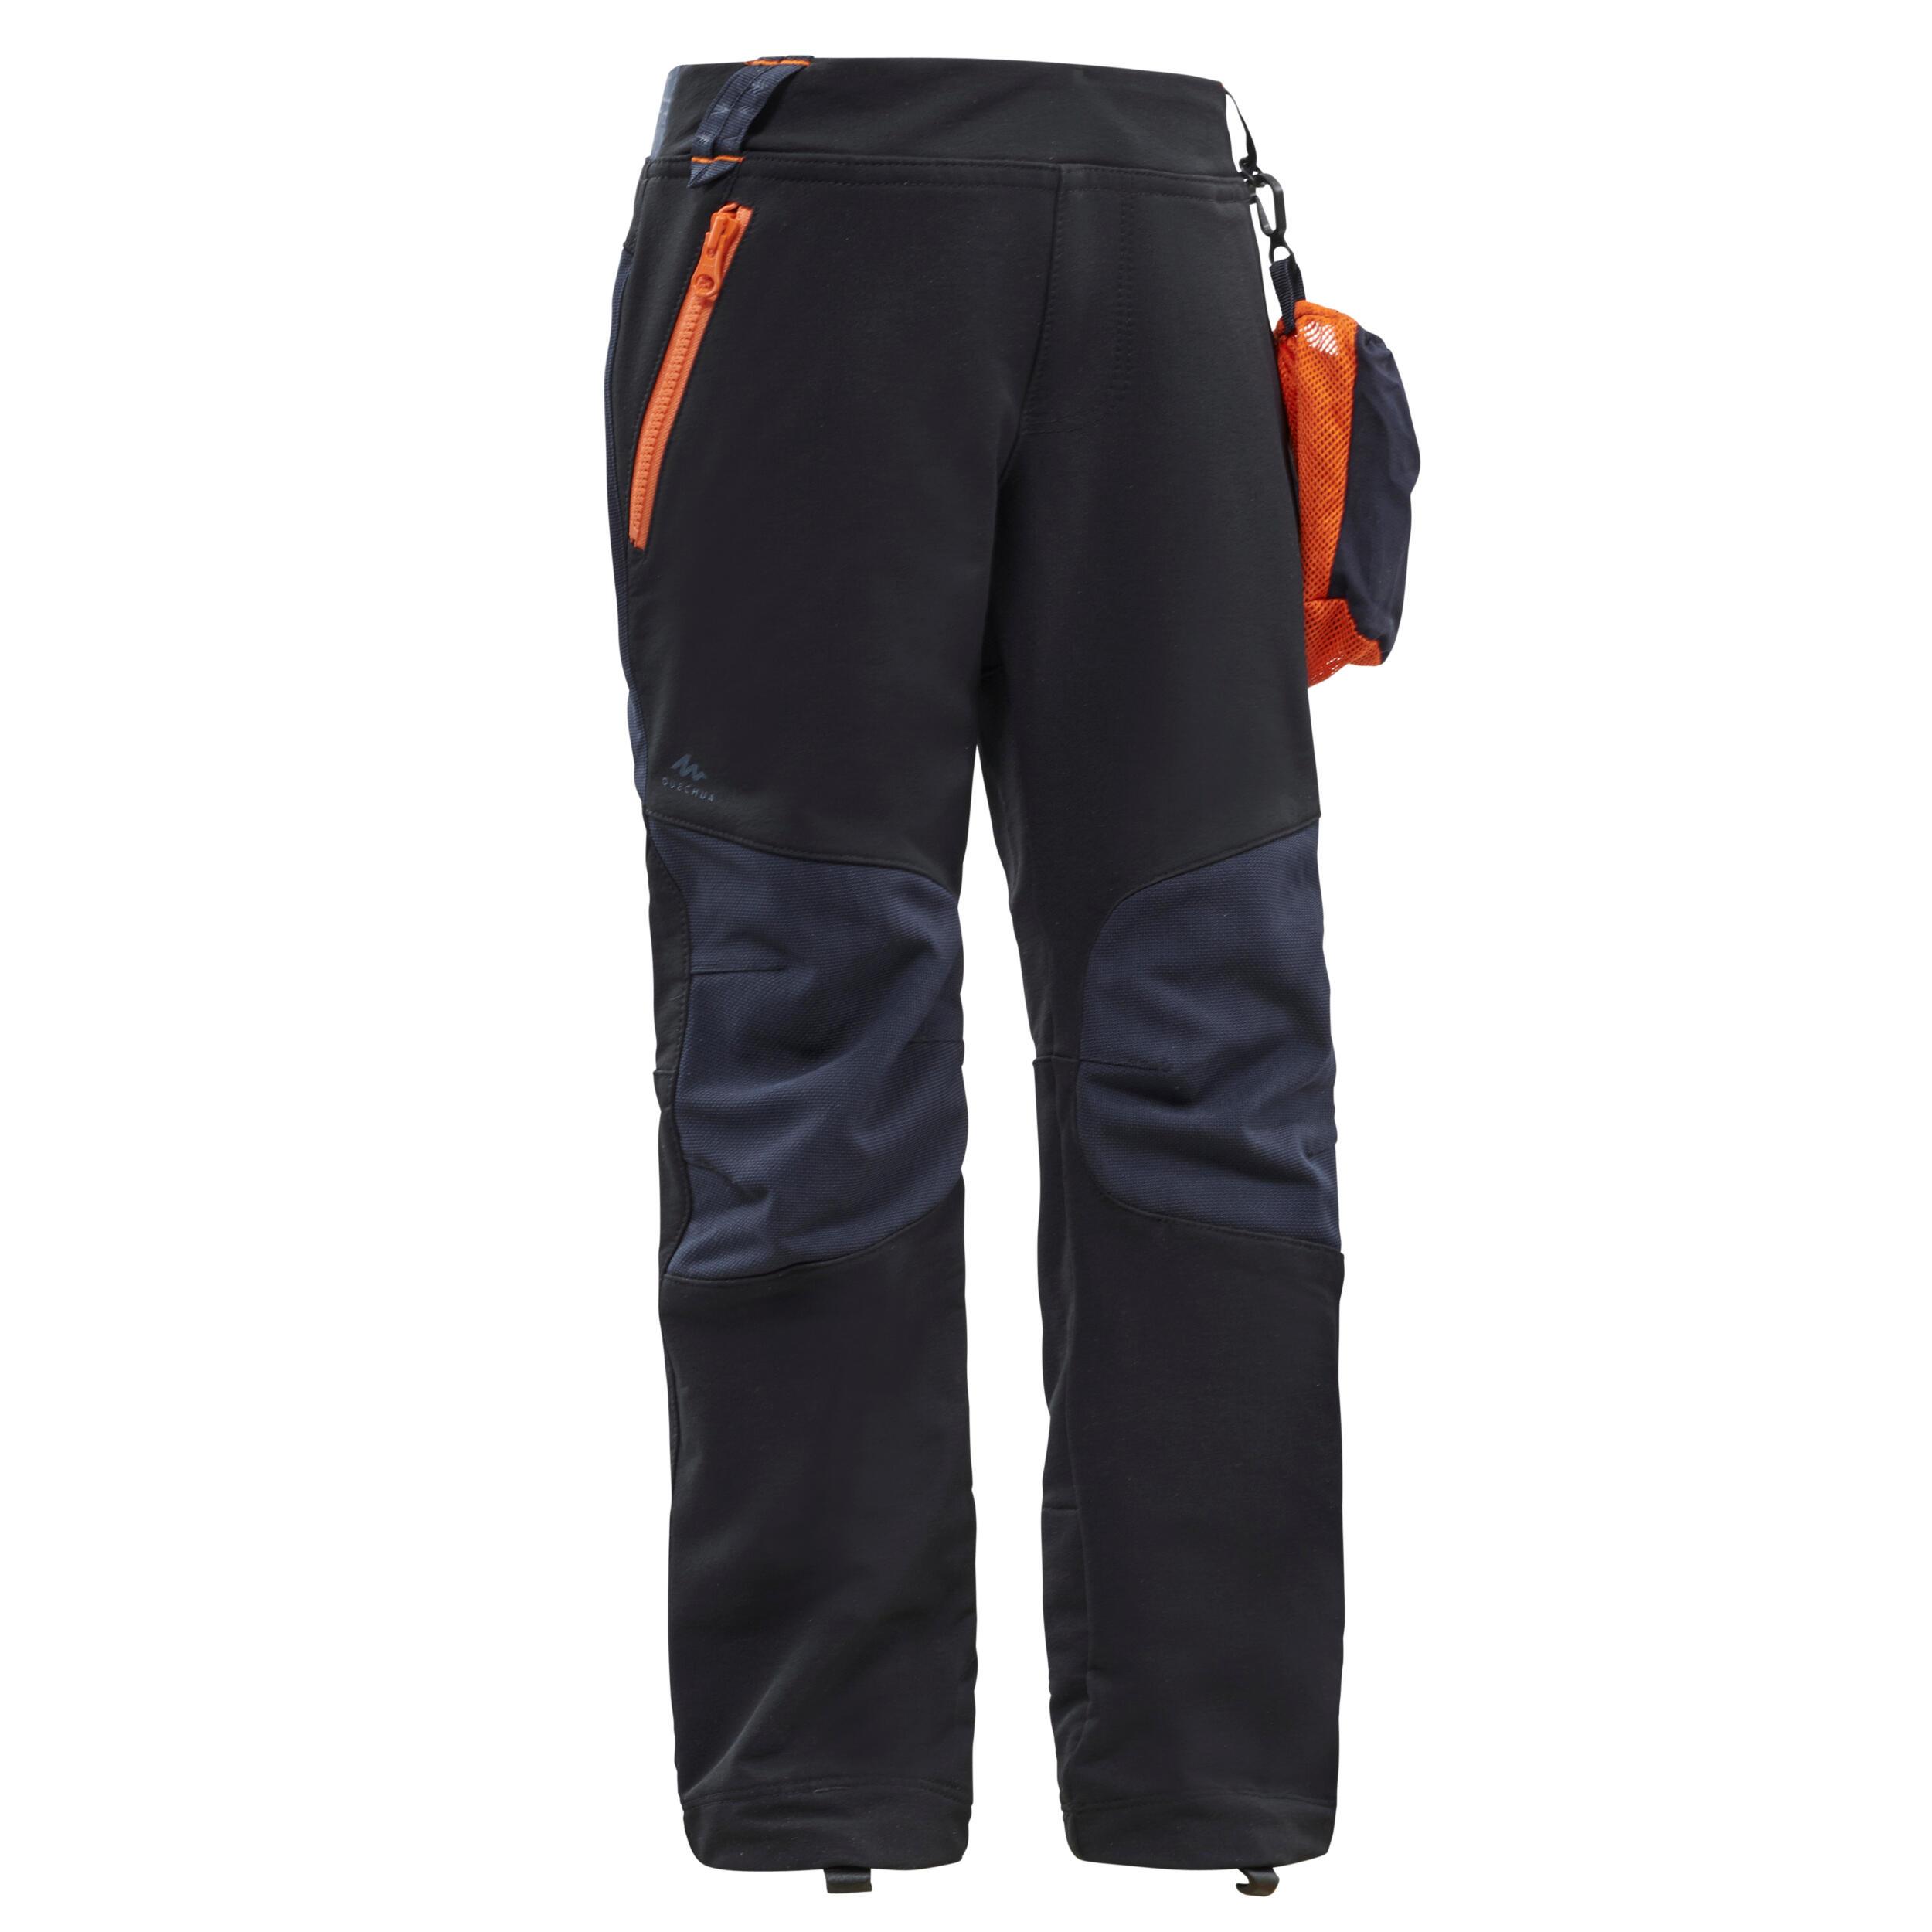 new products fb054 6384e Oberbekleidung Kinder | Günstige Preise | DECATHLON